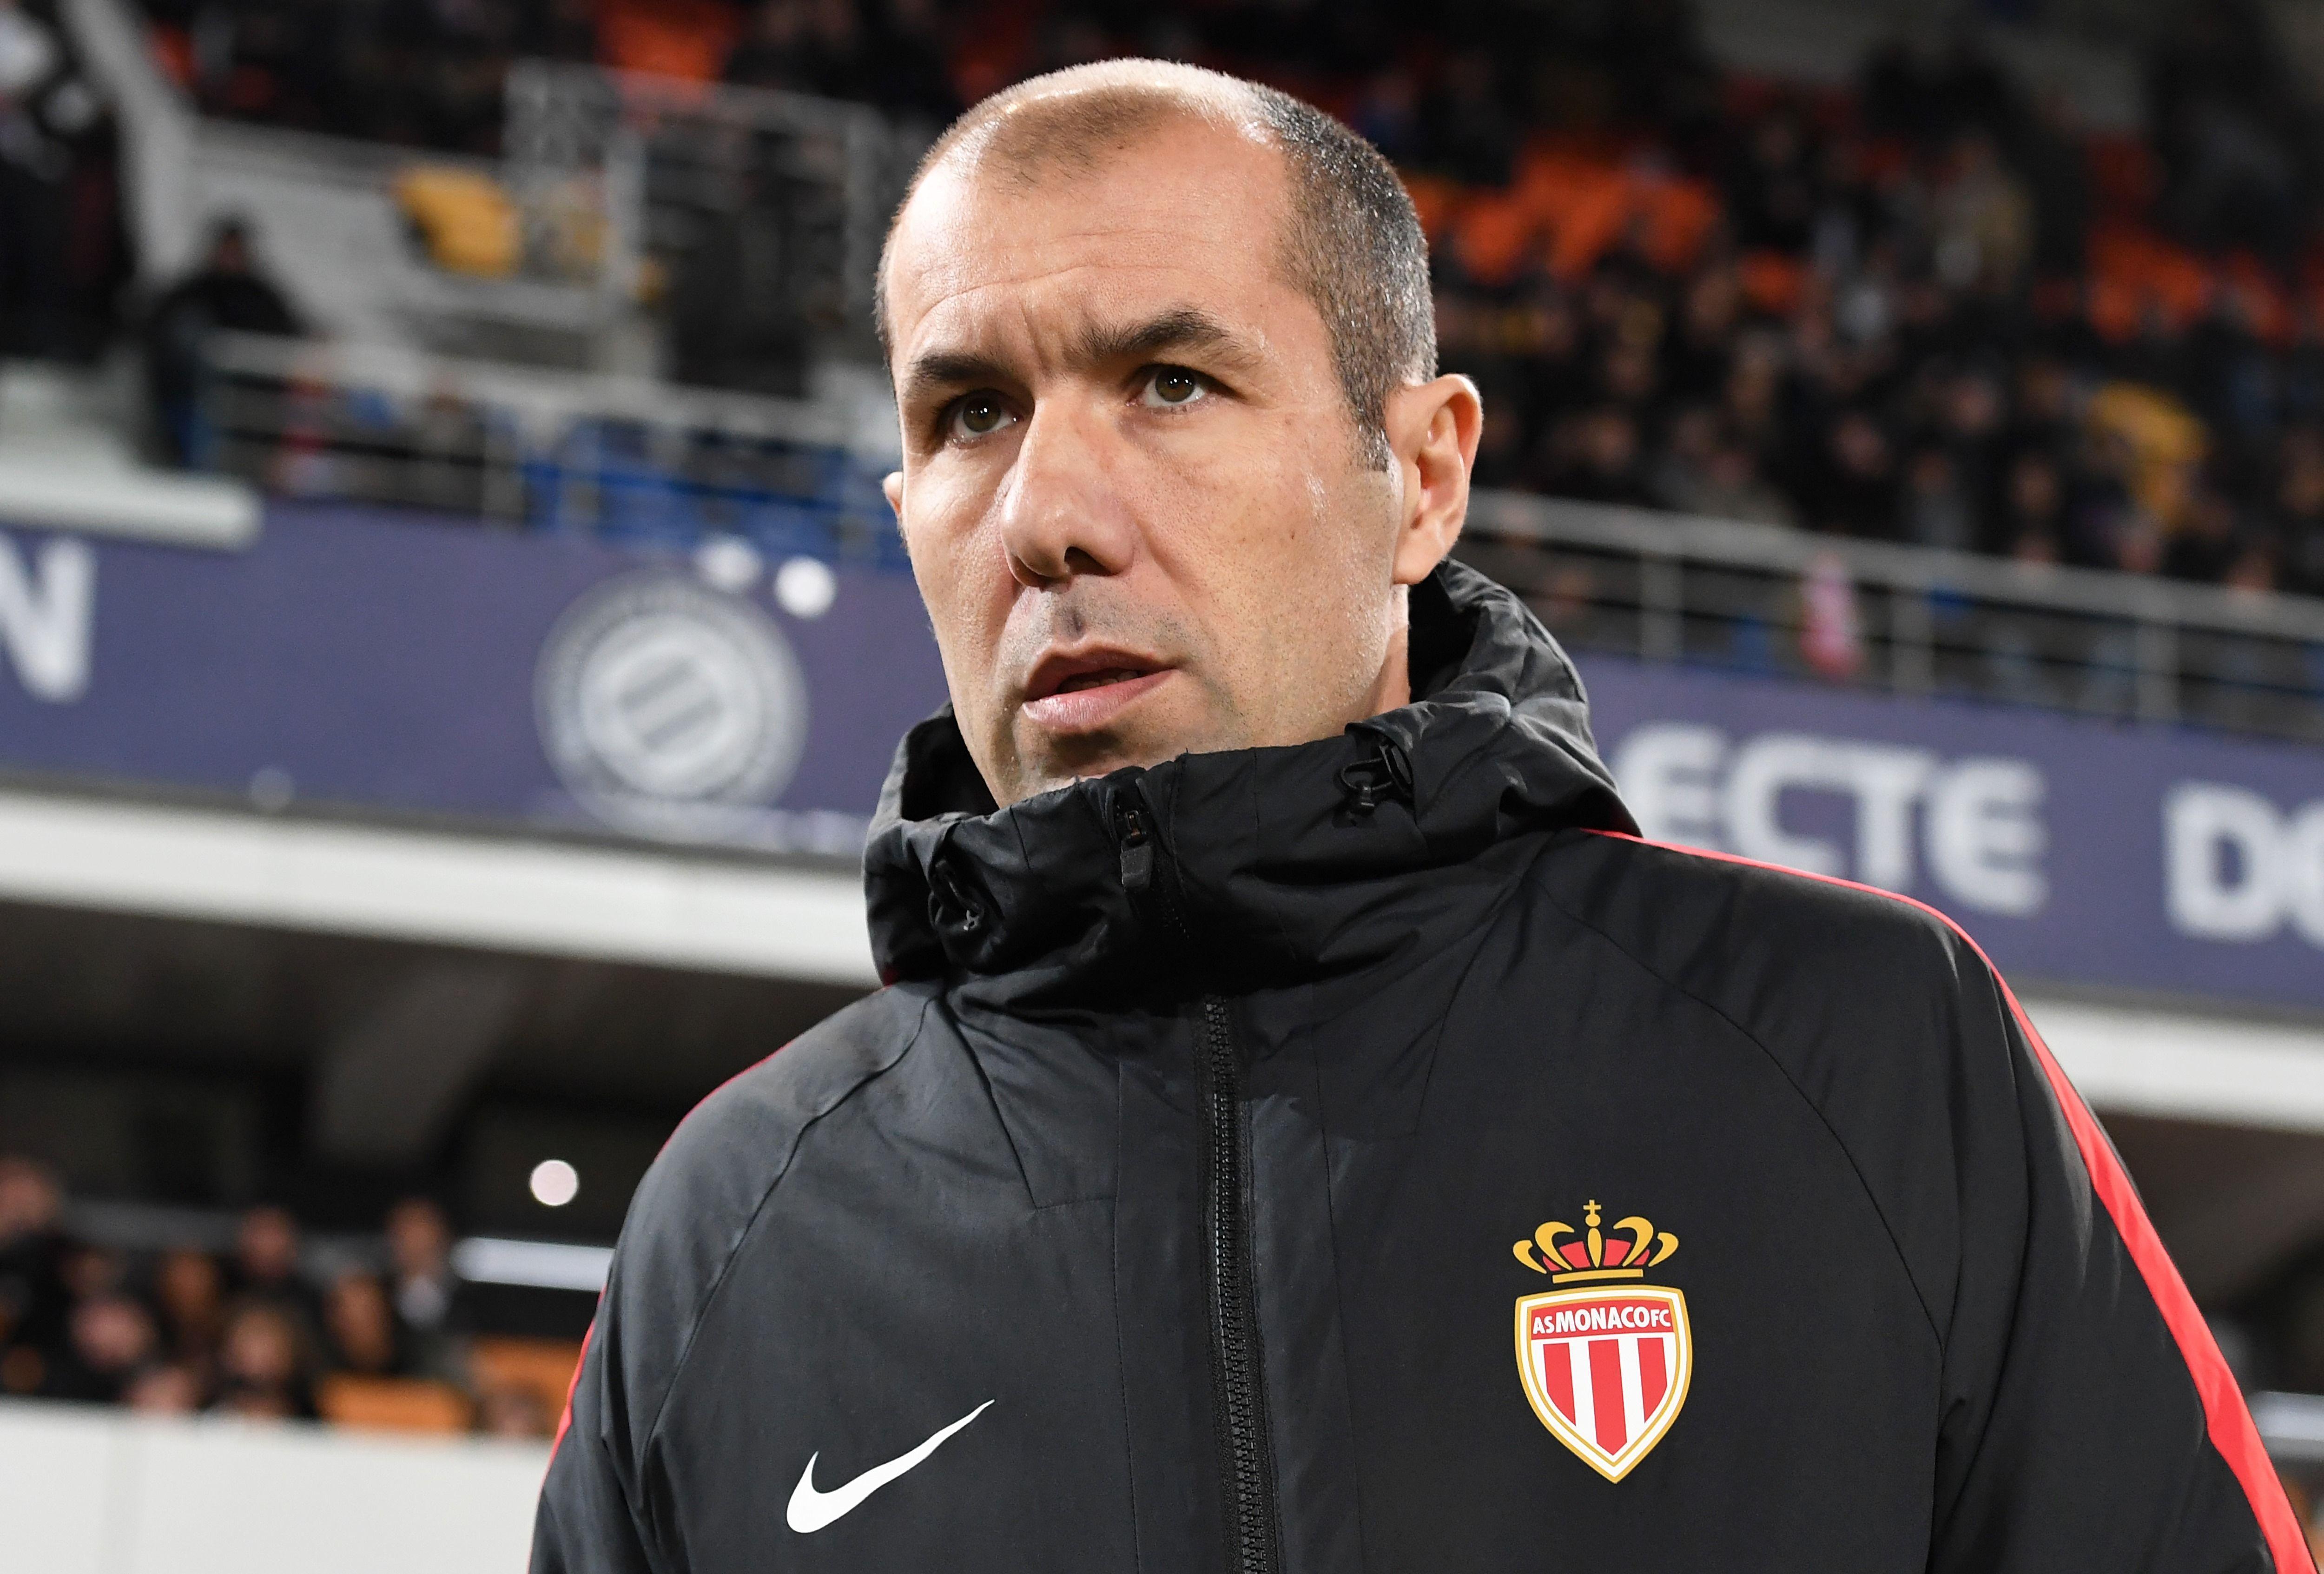 Monaco boss Leonardo Jardim has won admirers for his work with the French club